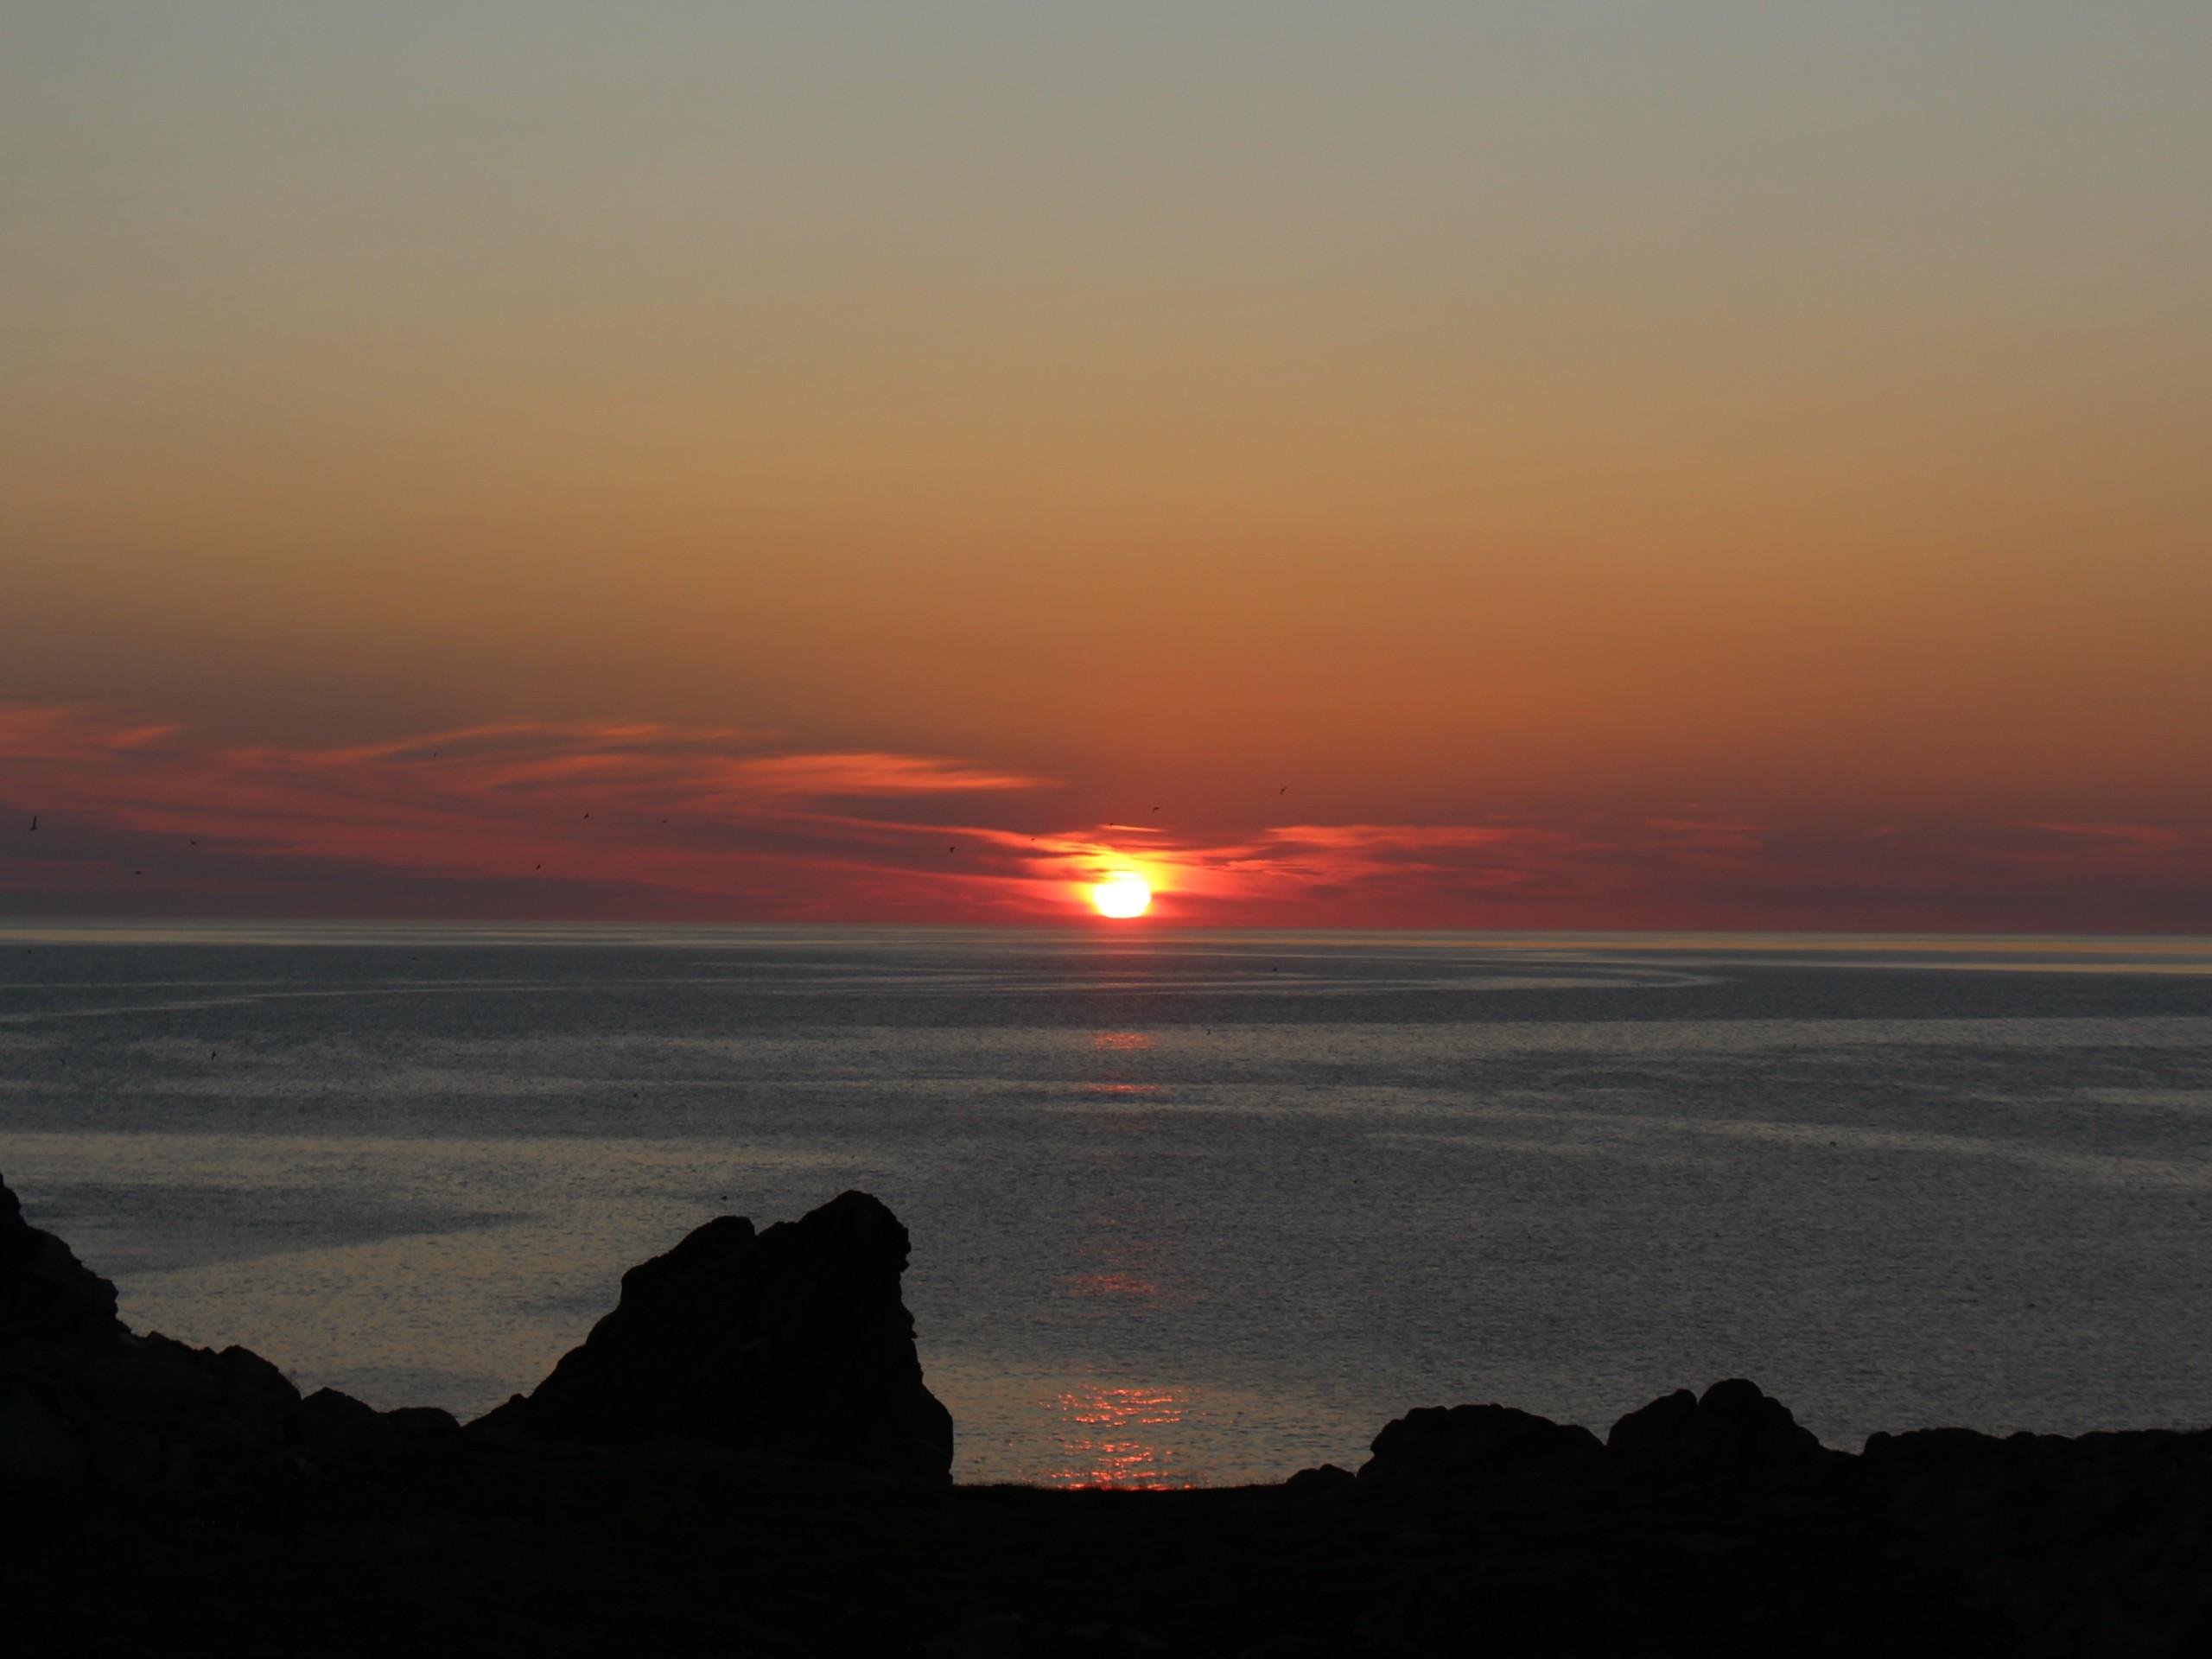 Sunset over the Atlantic Ocean (Canada)